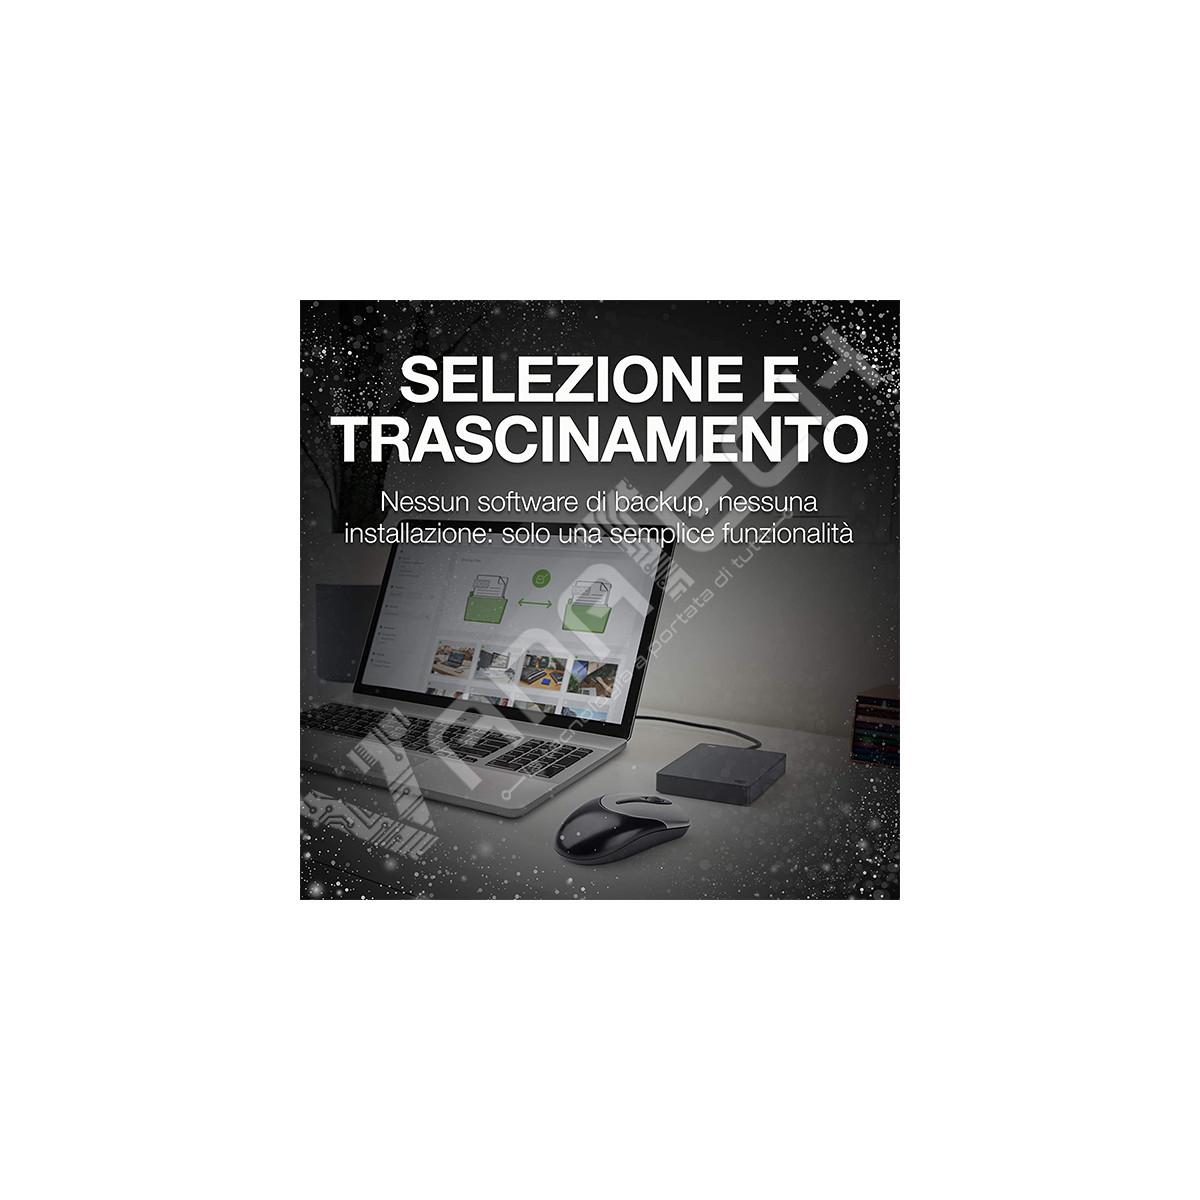 MULTIPRESA PRESA UNIVERSALE 3 SPINE 5 USB 3.4A INTERRUTTORE DISPLAY ANDOWL Q-688 CAVO 2 METRI